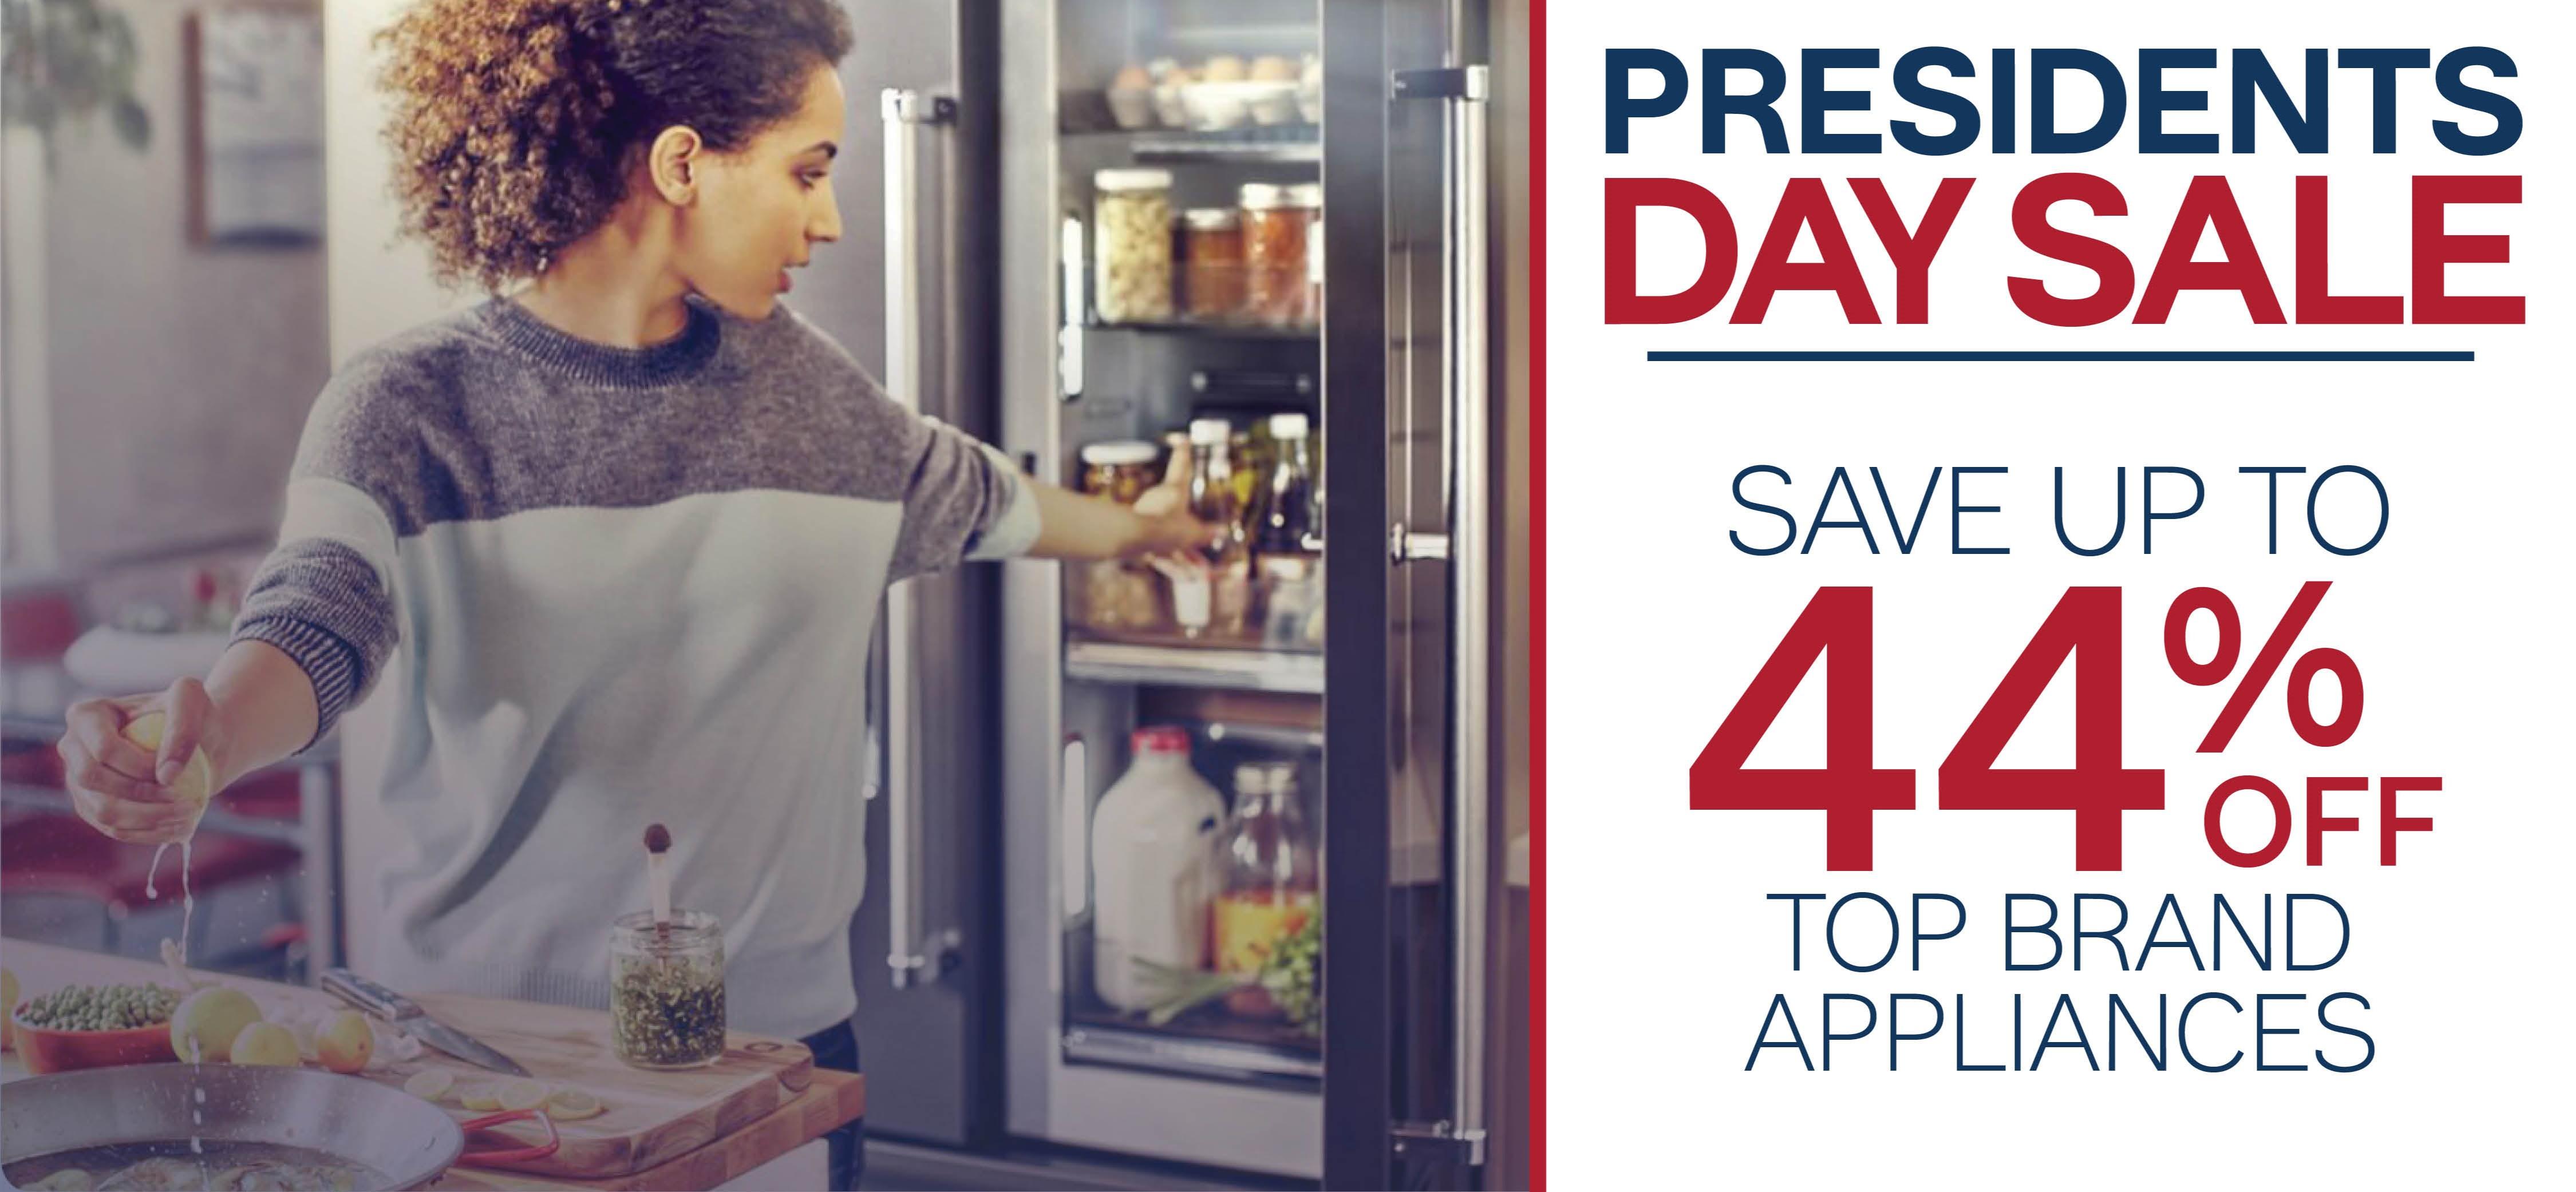 Furniture & ApplianceMart Presidents Day Weekend